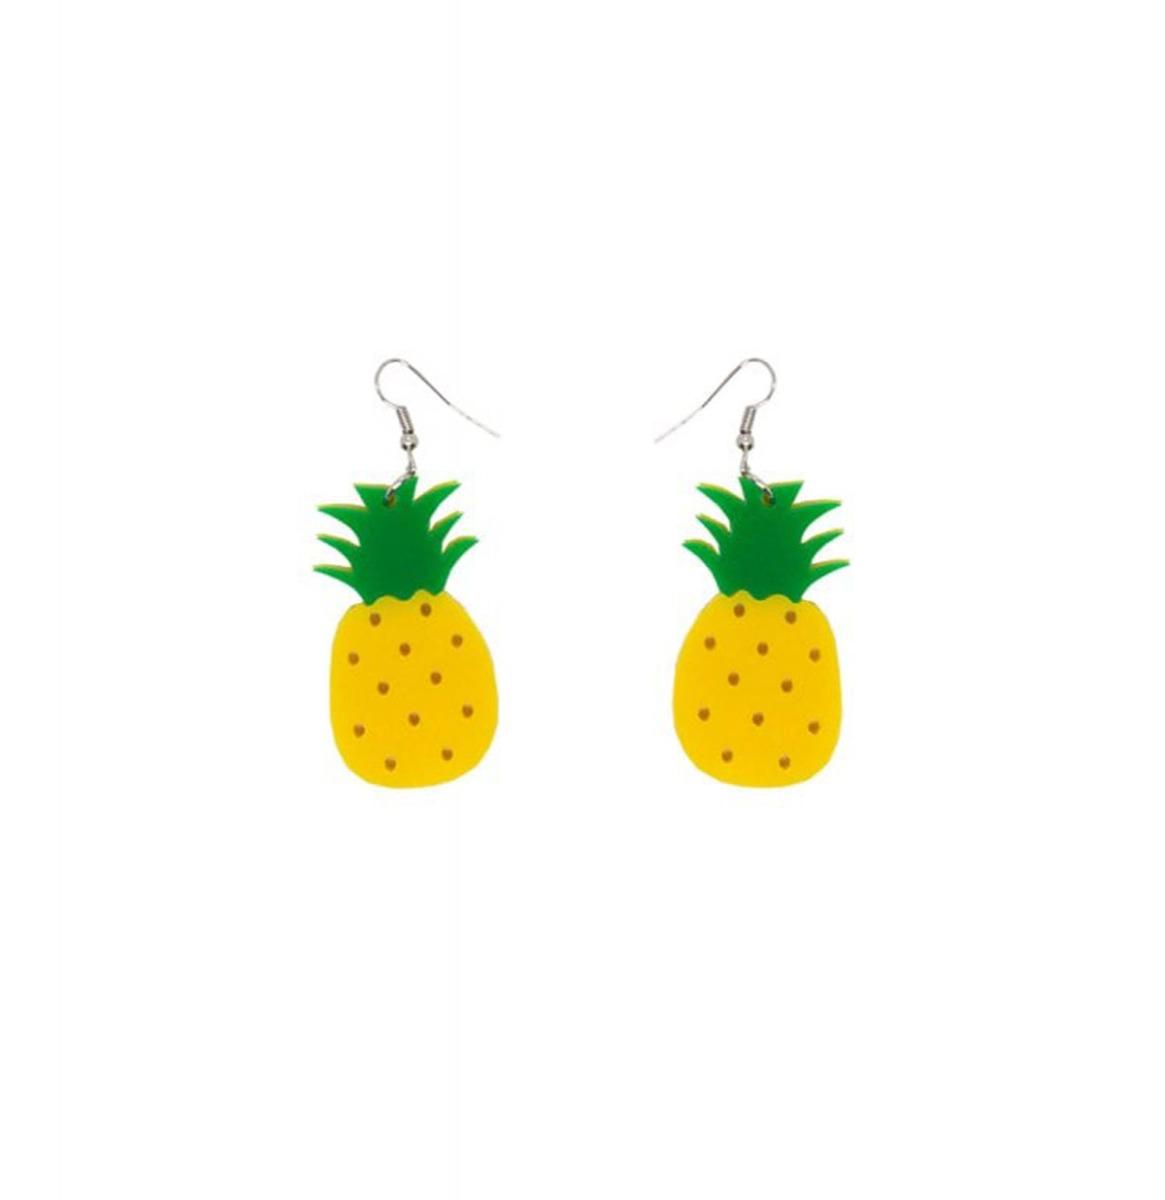 Pineapple Acrylic Drop Earrings